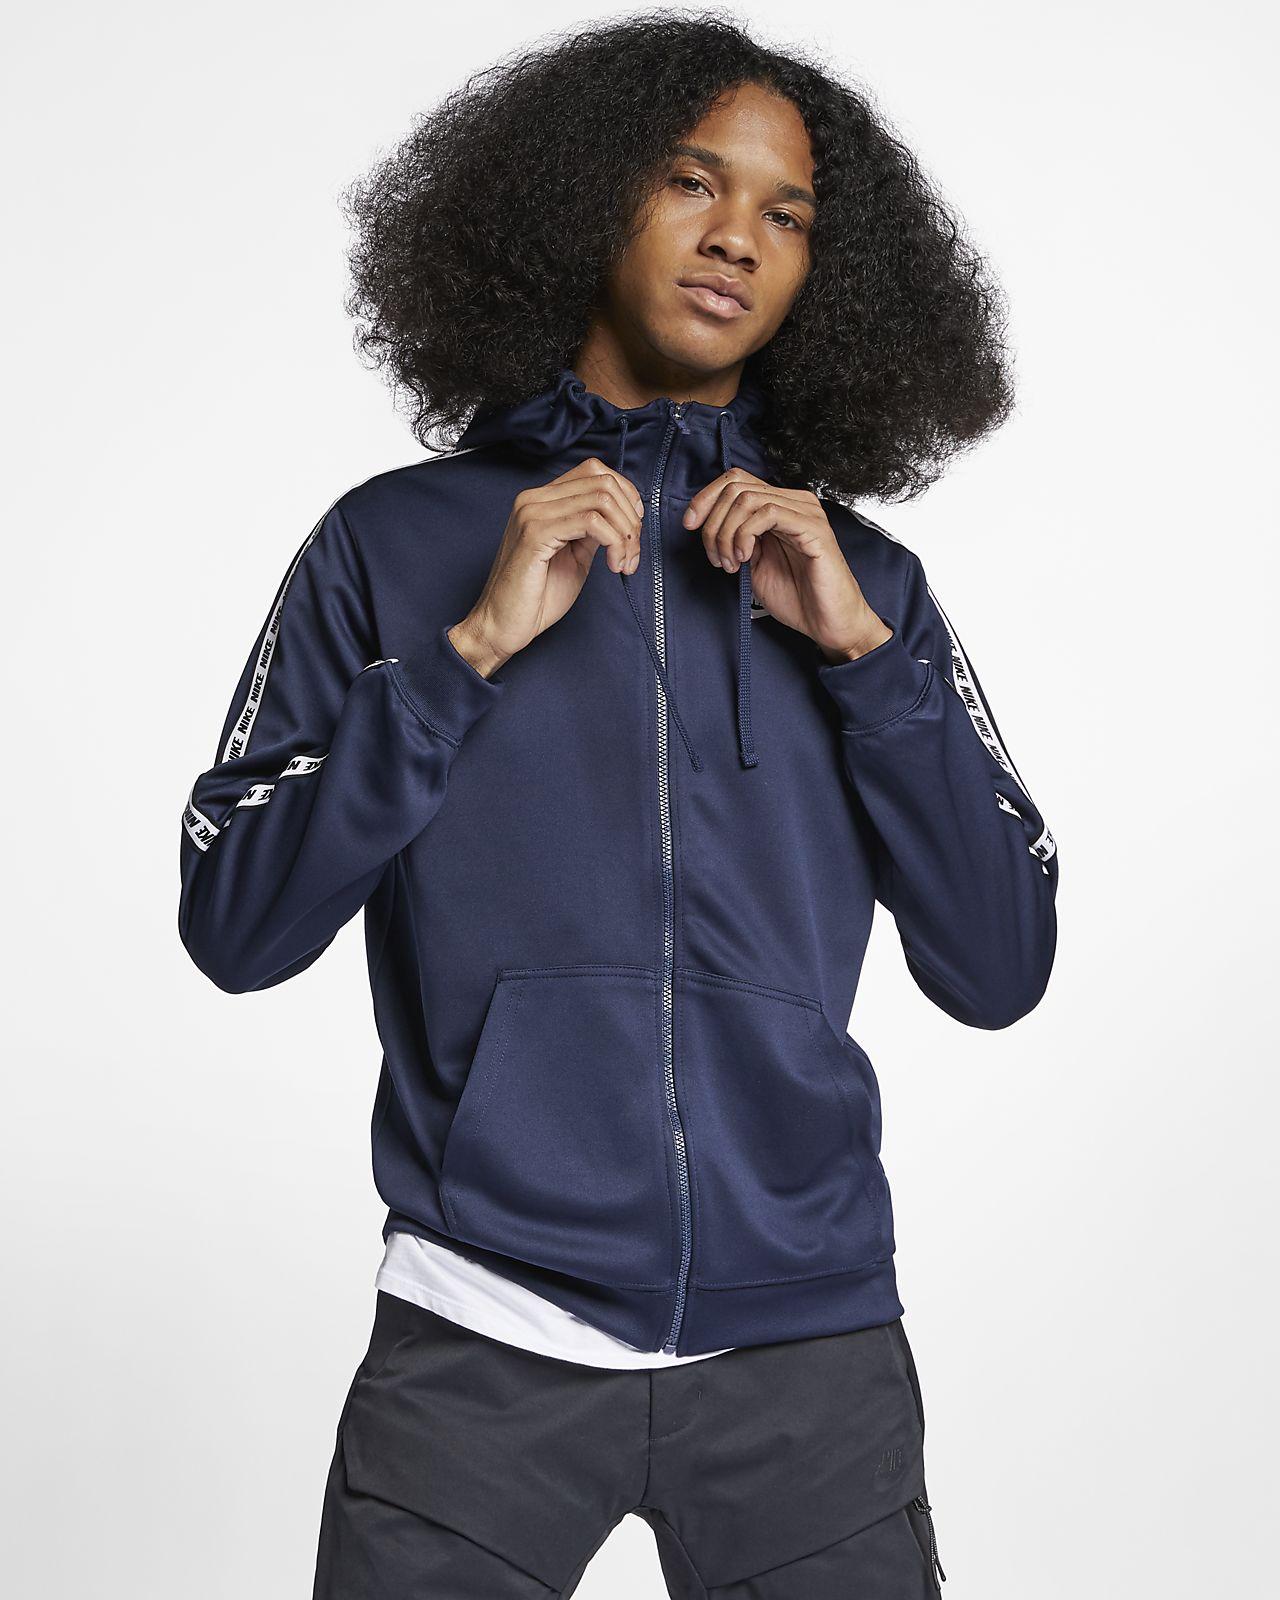 e89ab3d16b Nike Sportswear Men's Full-Zip Hoodie. Nike.com CH